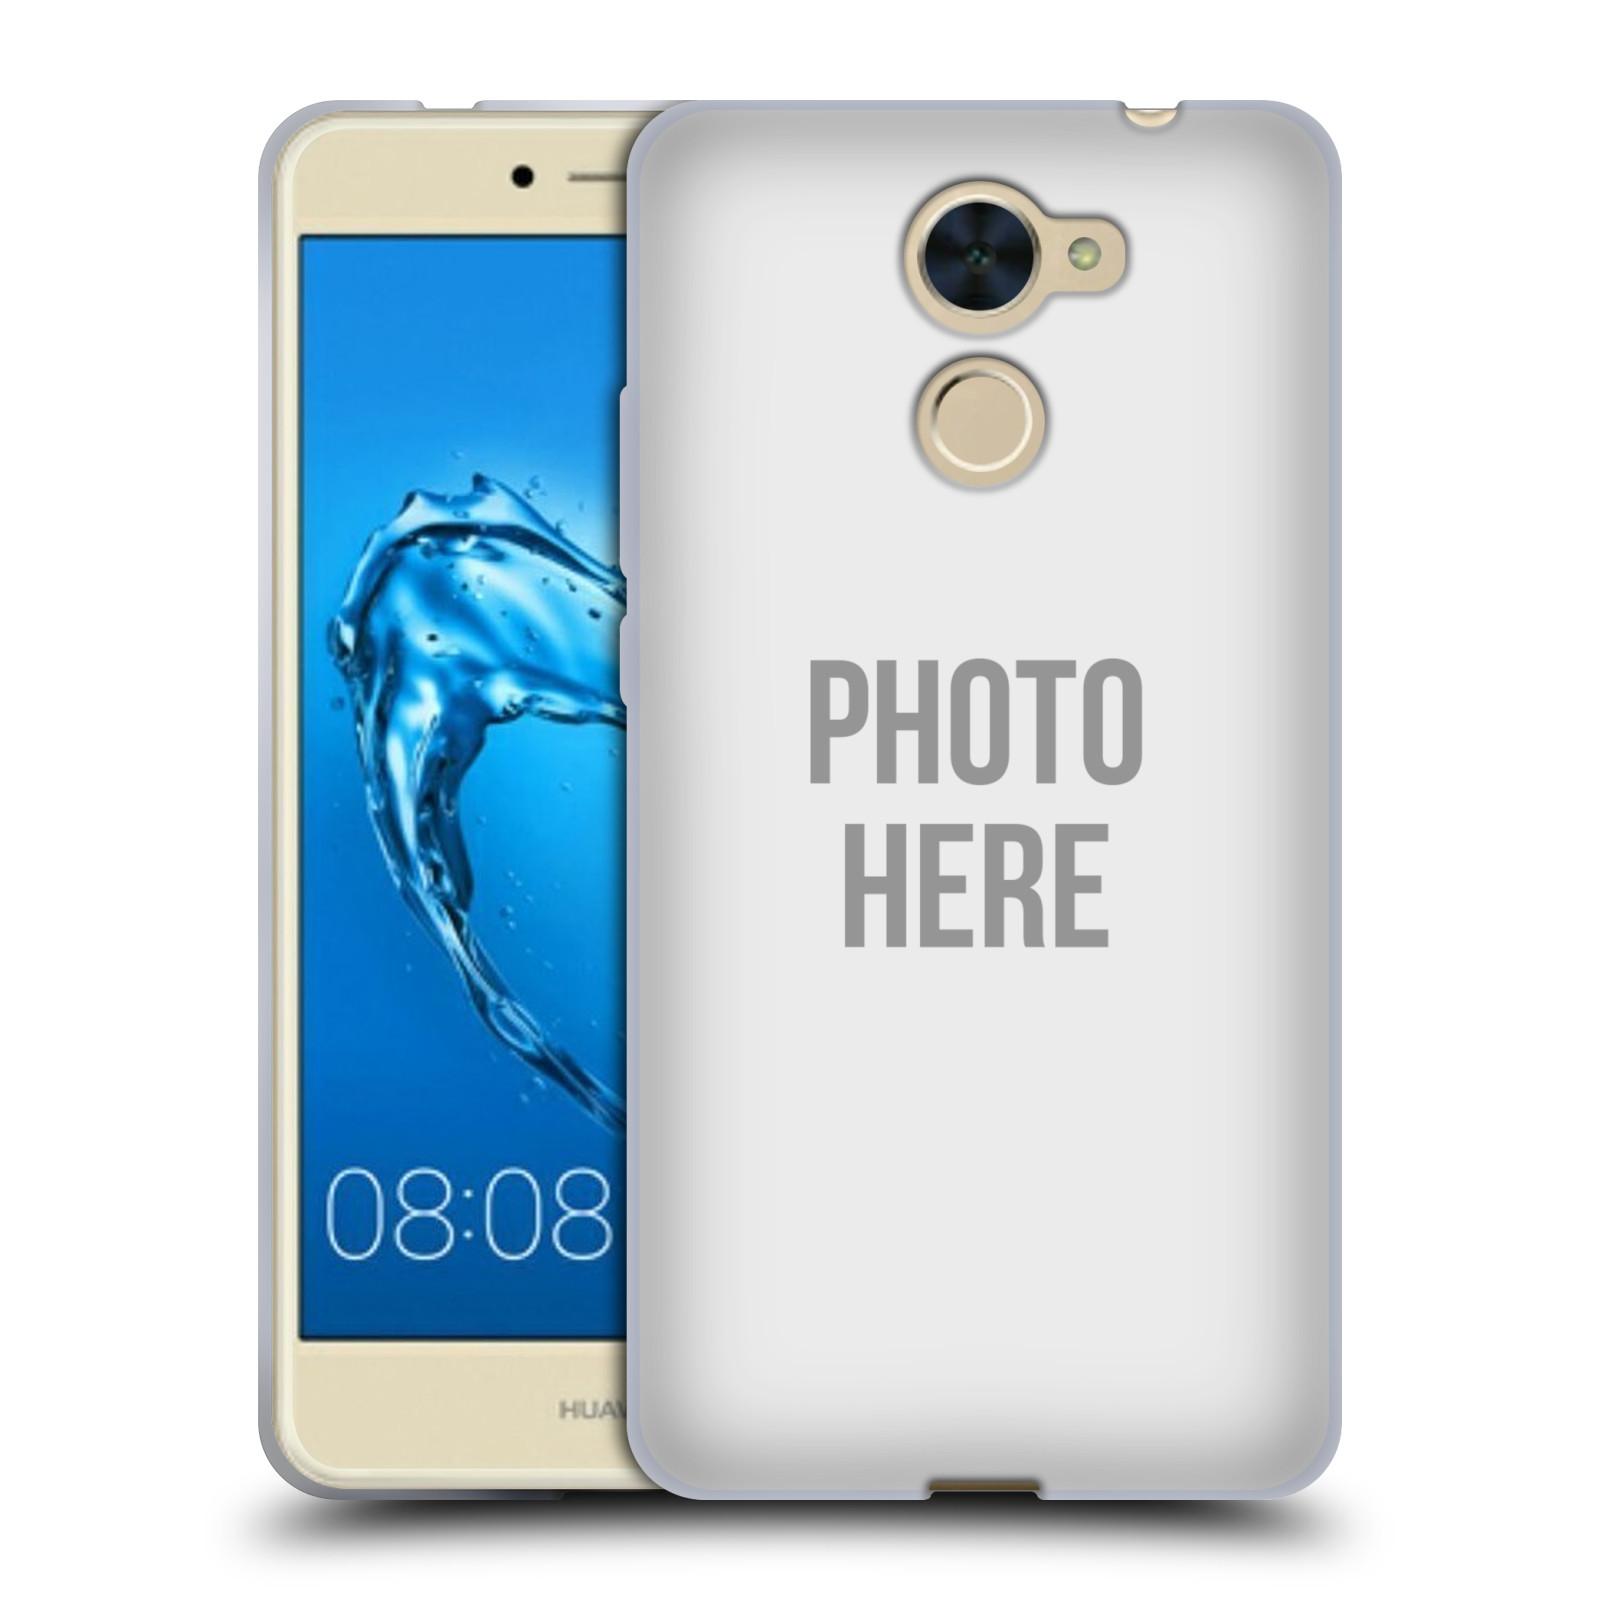 Silikonové pouzdro na mobil Huawei Y7 - Head Case - s vlastním motivem